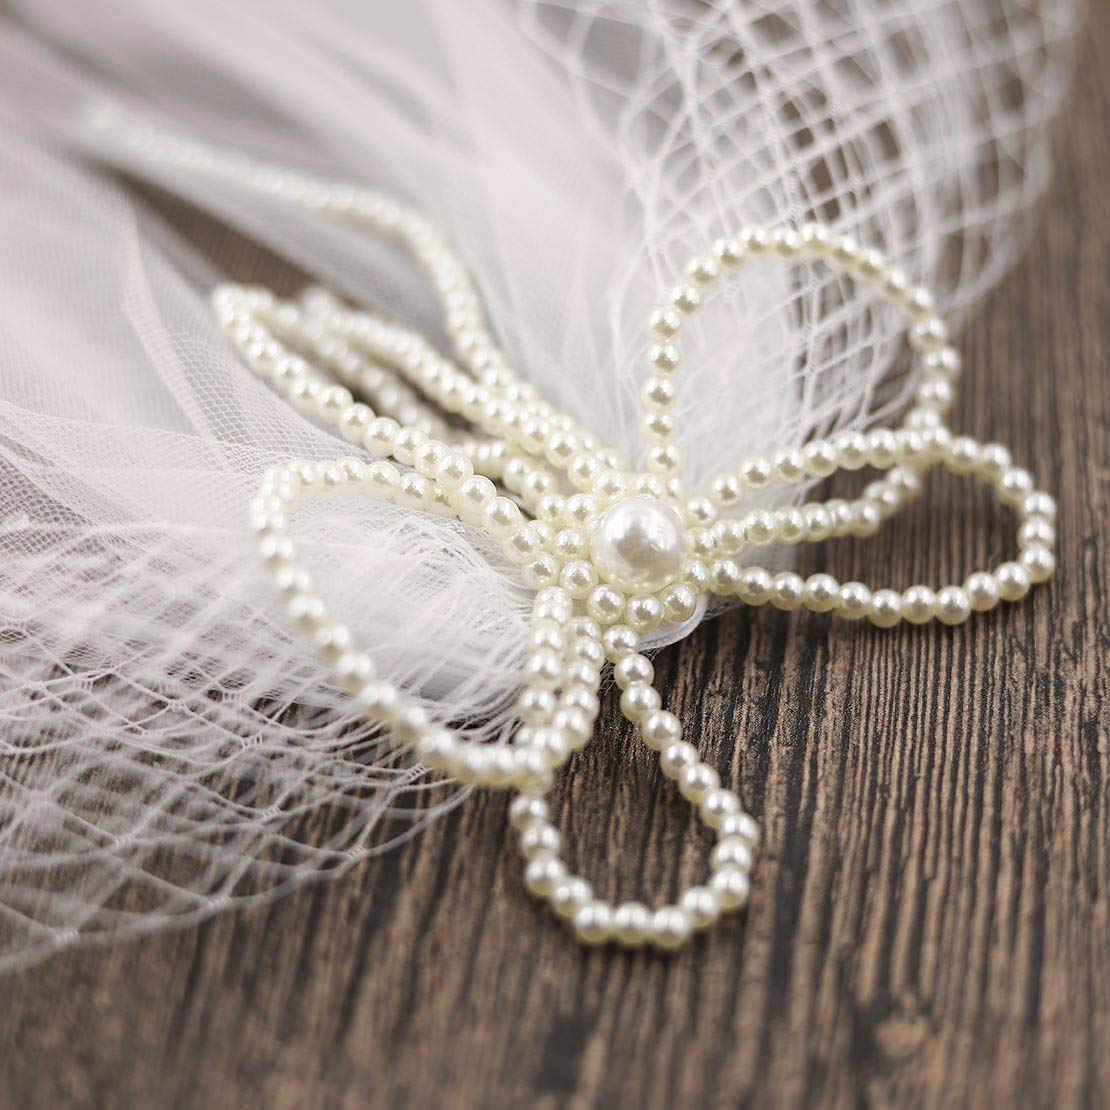 Fangsen Wedding Bridal Pearl Flower Mesh Veil with Comb 1 Tier Bridal Fingertip veil ( (2T Pearl hair accessories)